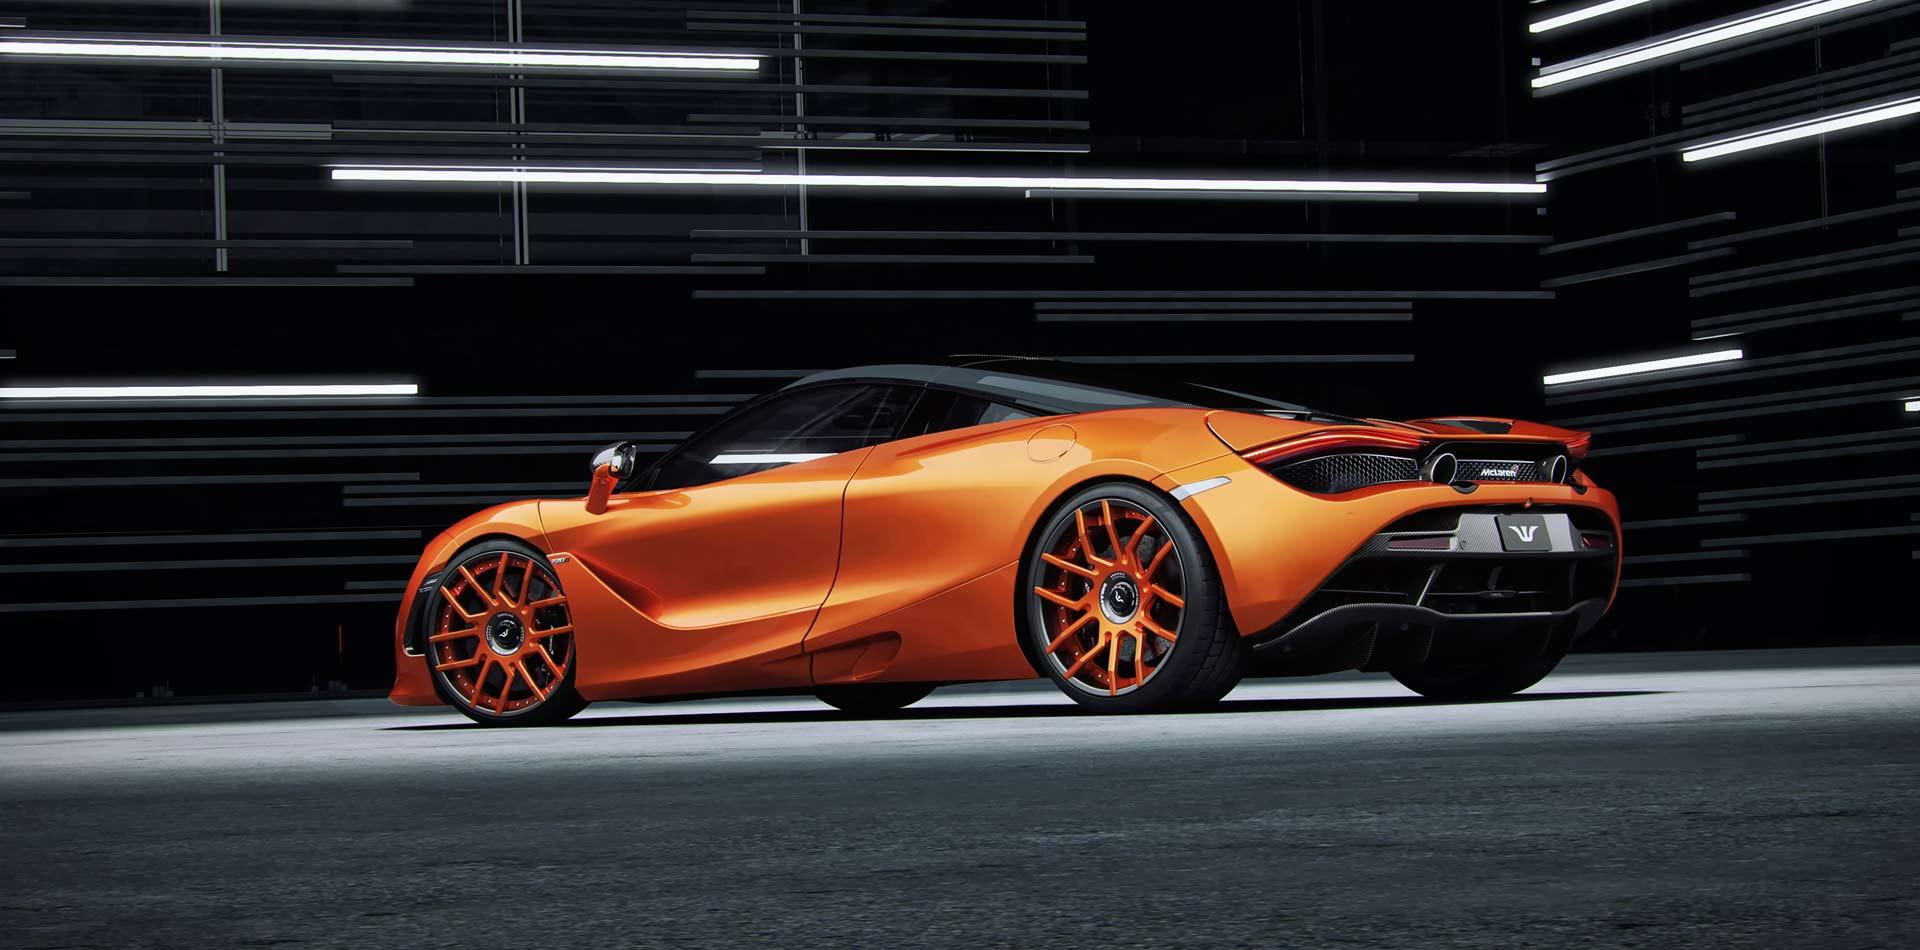 McLaren 720S Tuning, Felgen, Auspuffanlage